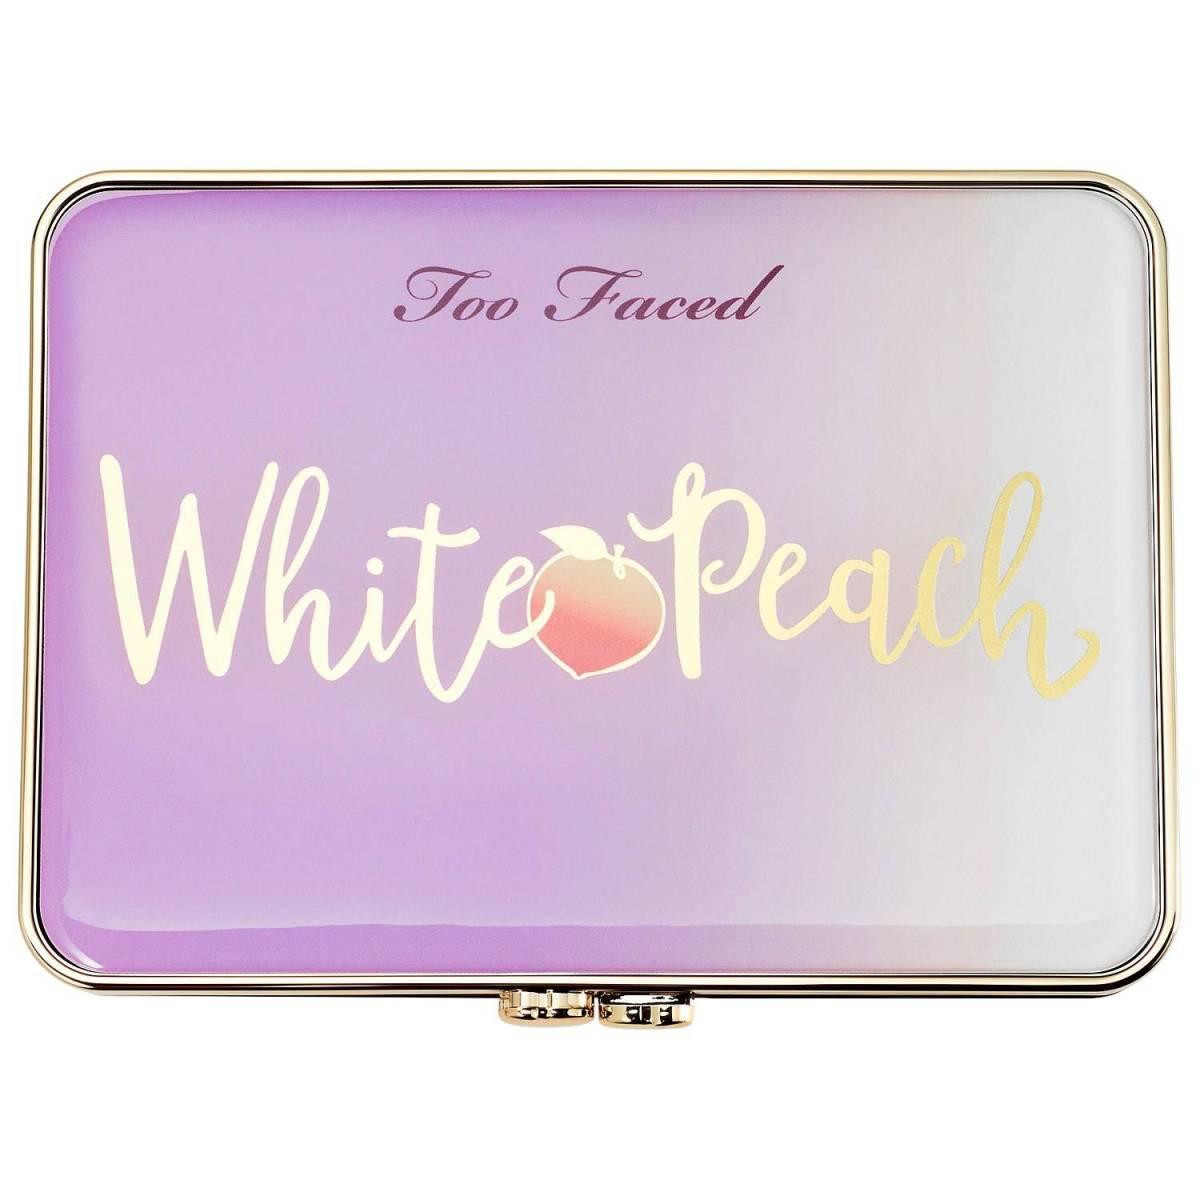 Revue #1 - Palette White Peach, Too Faced